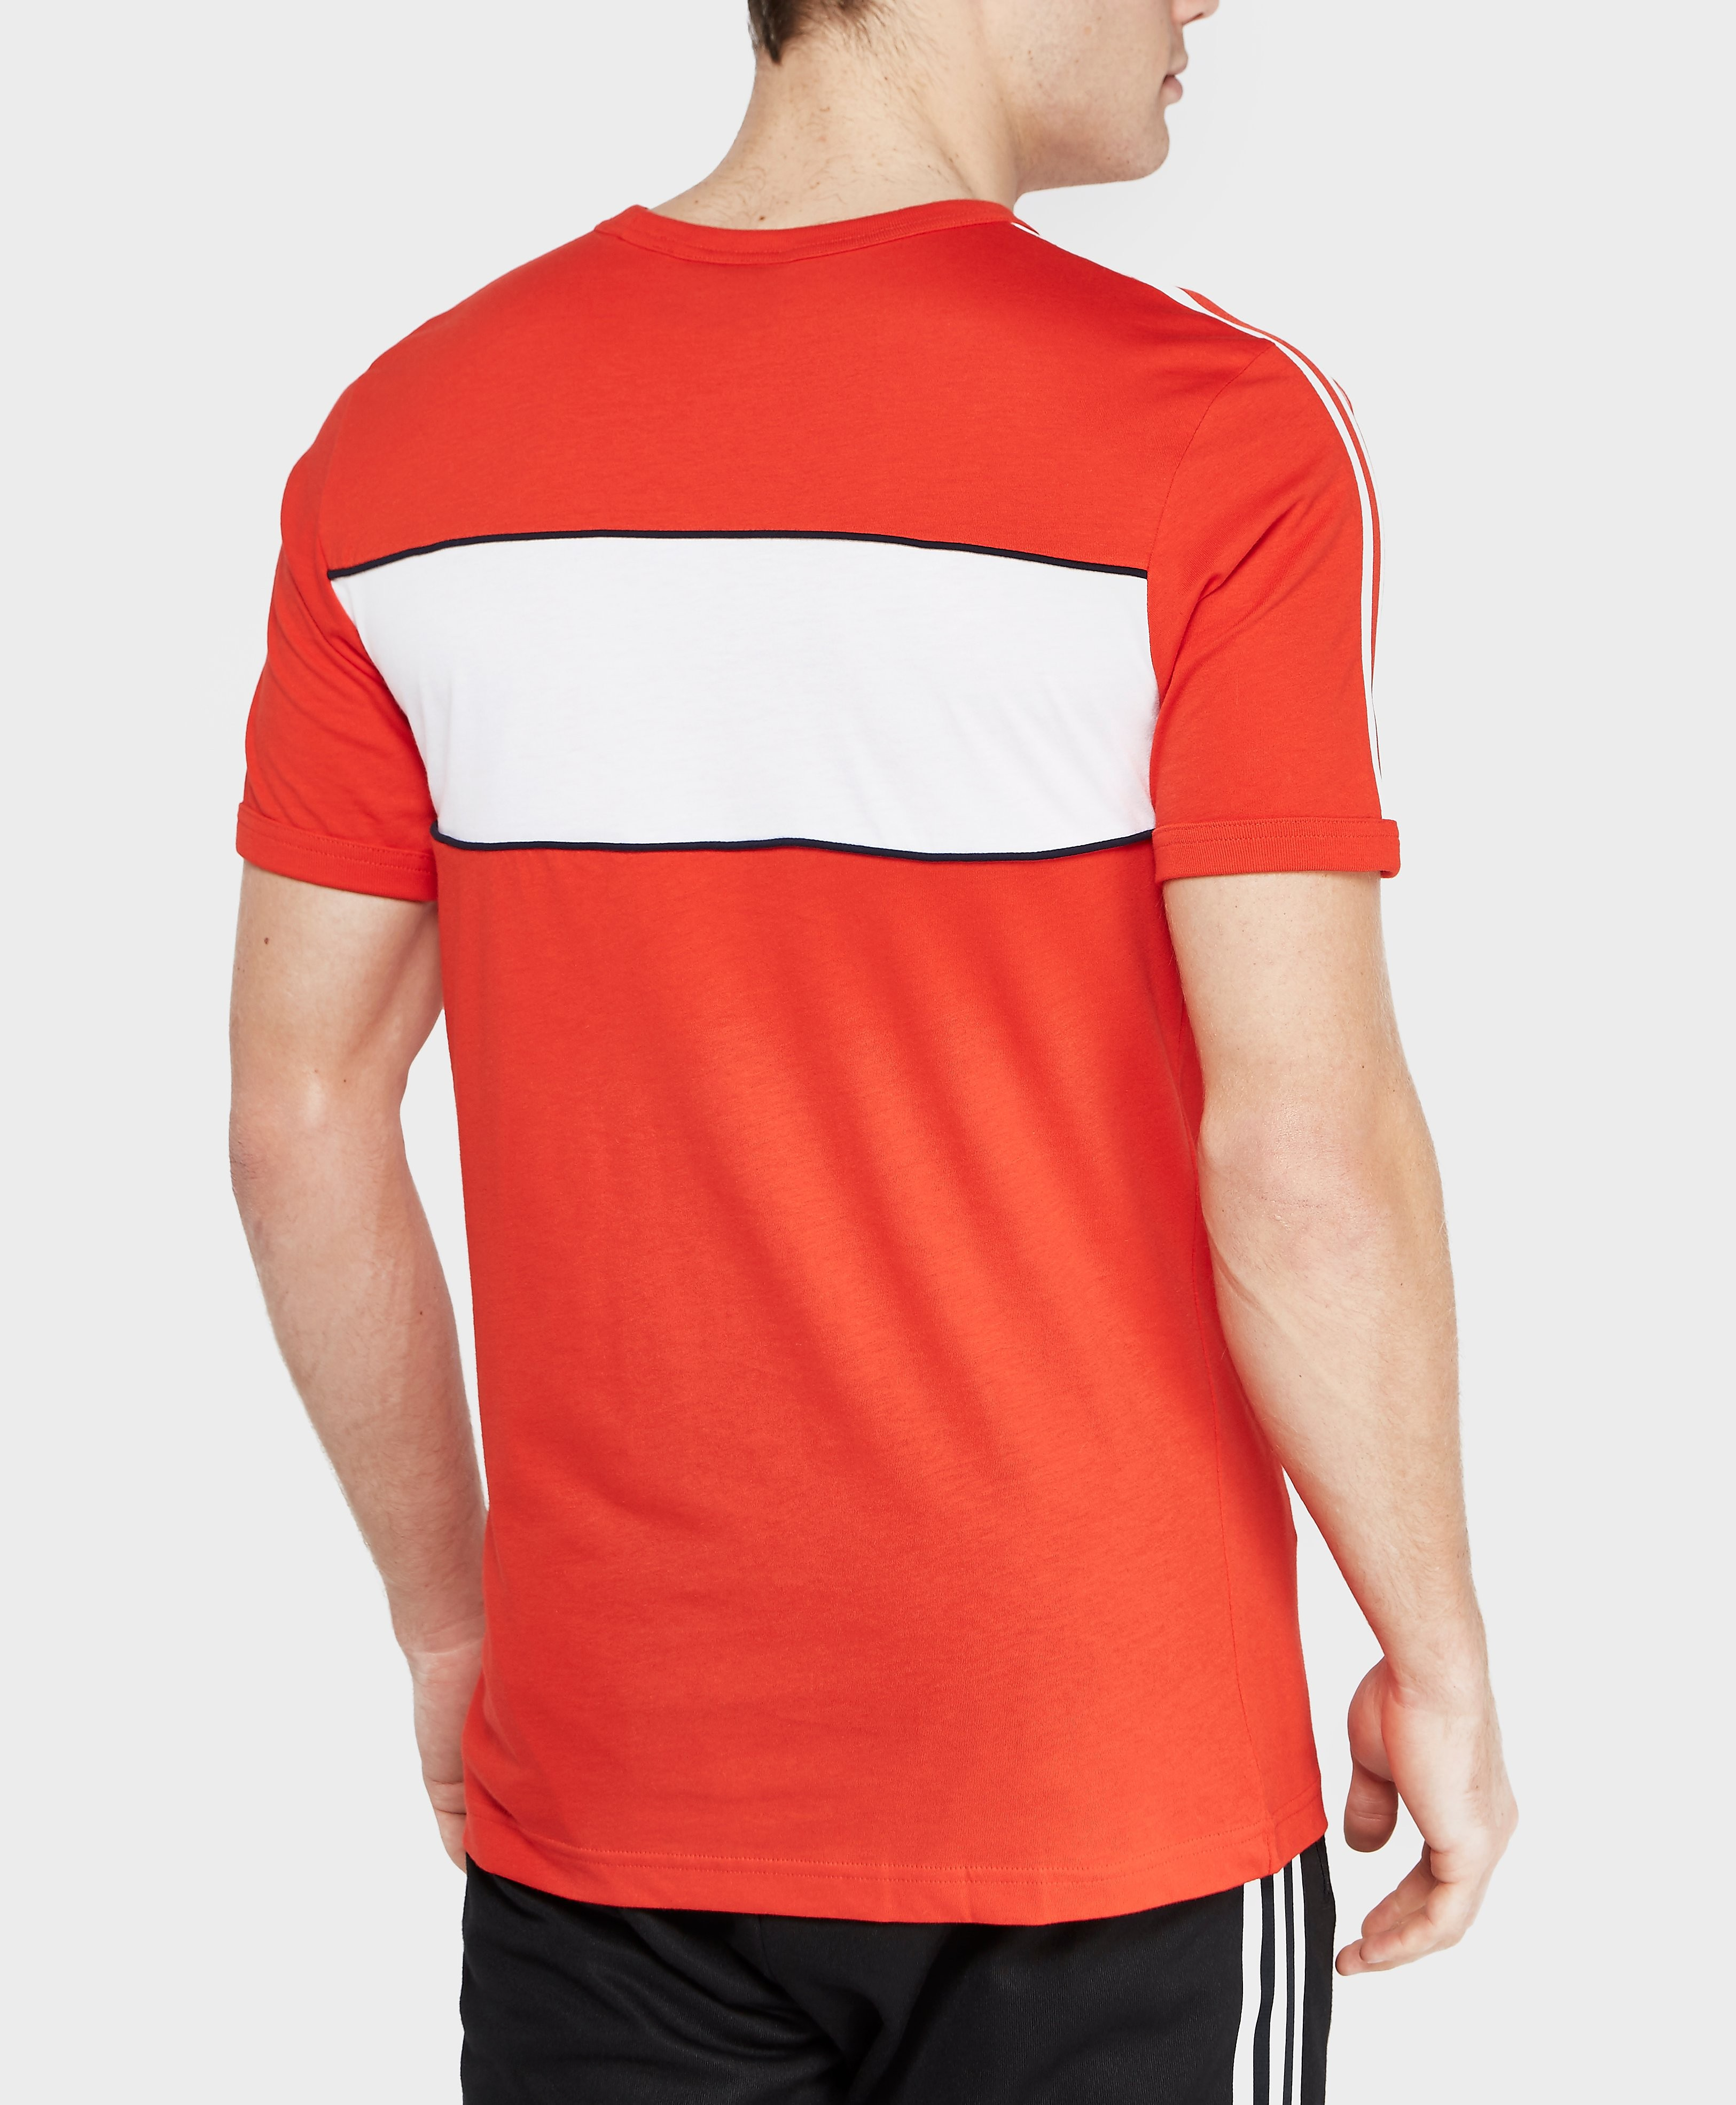 adidas Originals London Short Sleeve T-Shirt